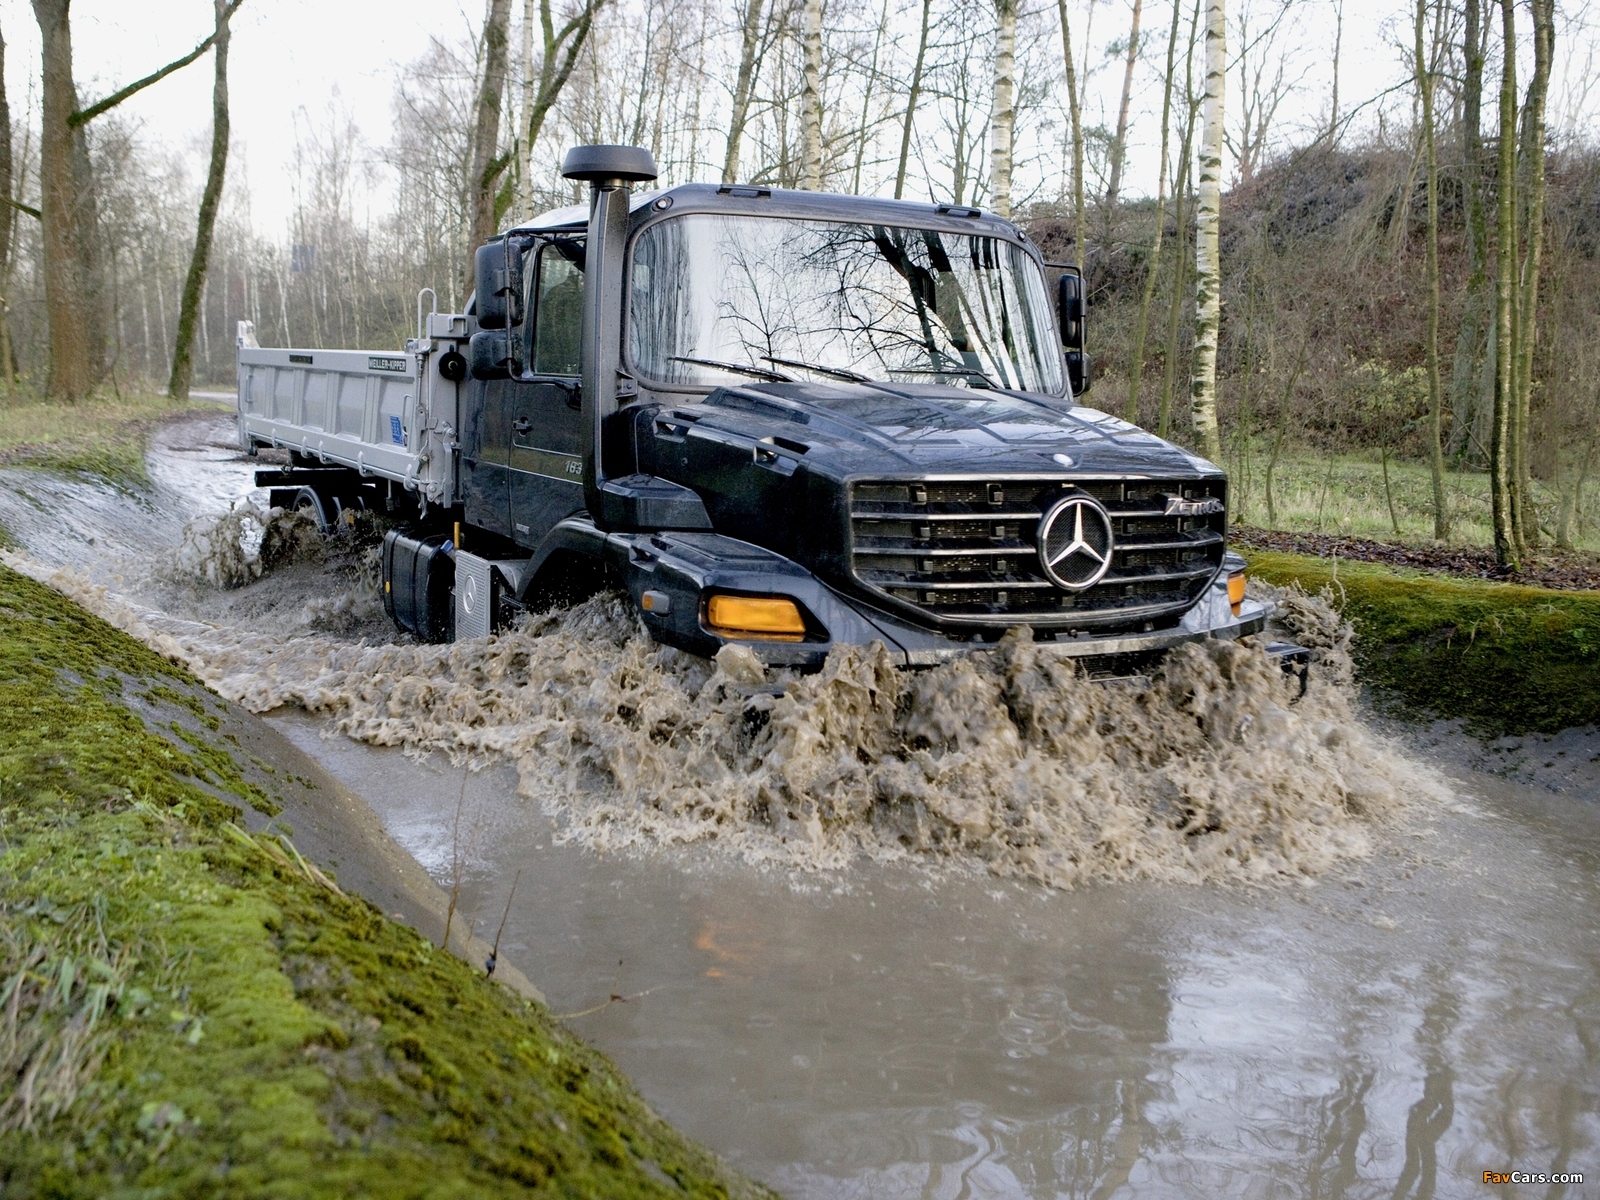 Mercedes-Benz Zetros 1833 2008 pictures (1600x1200)